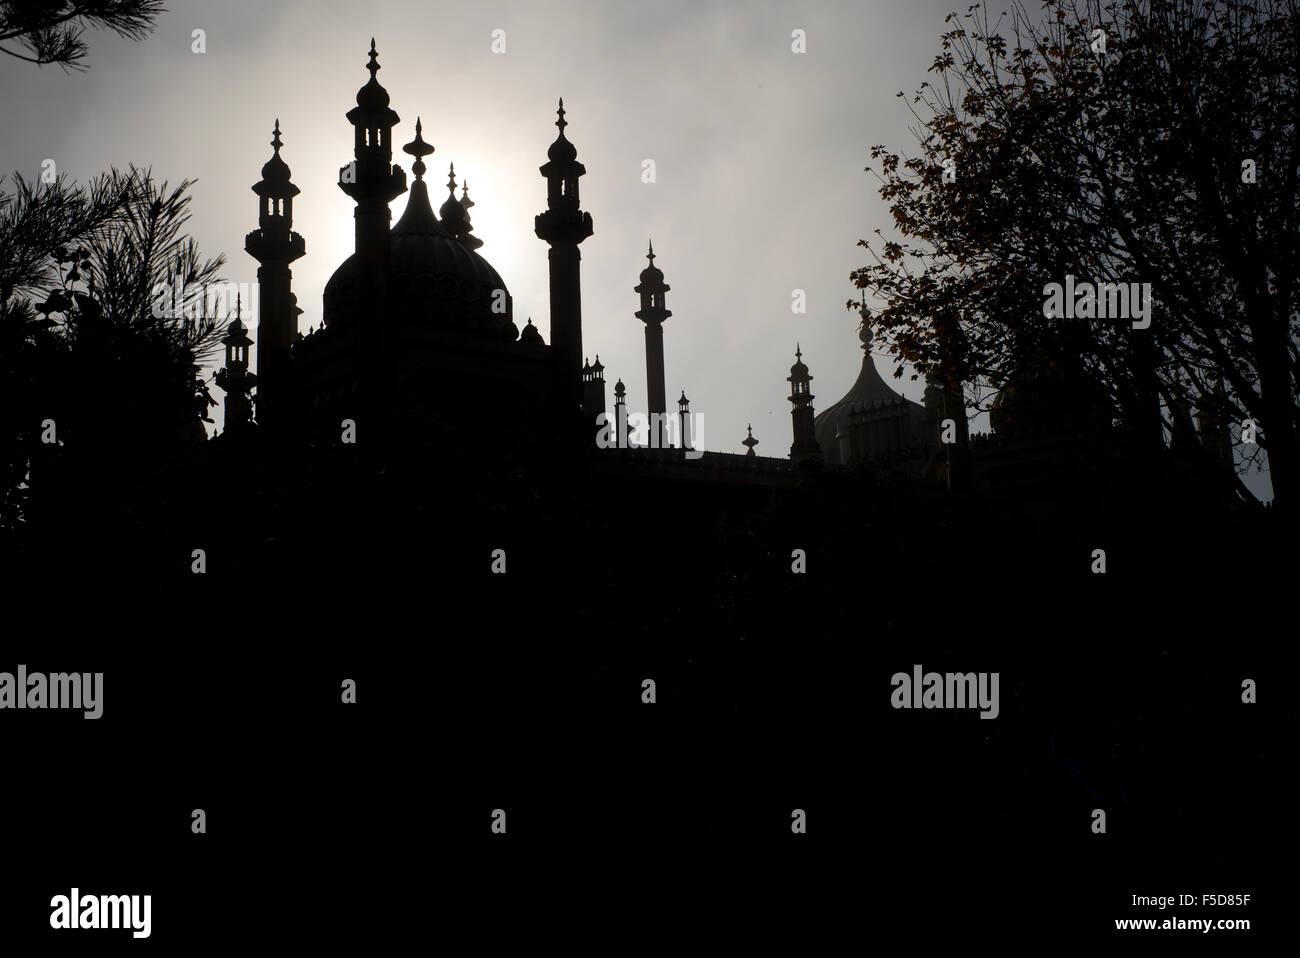 Brighton Royal Pavilion in silhouette, early morning, Brighton, UK Stock Photo